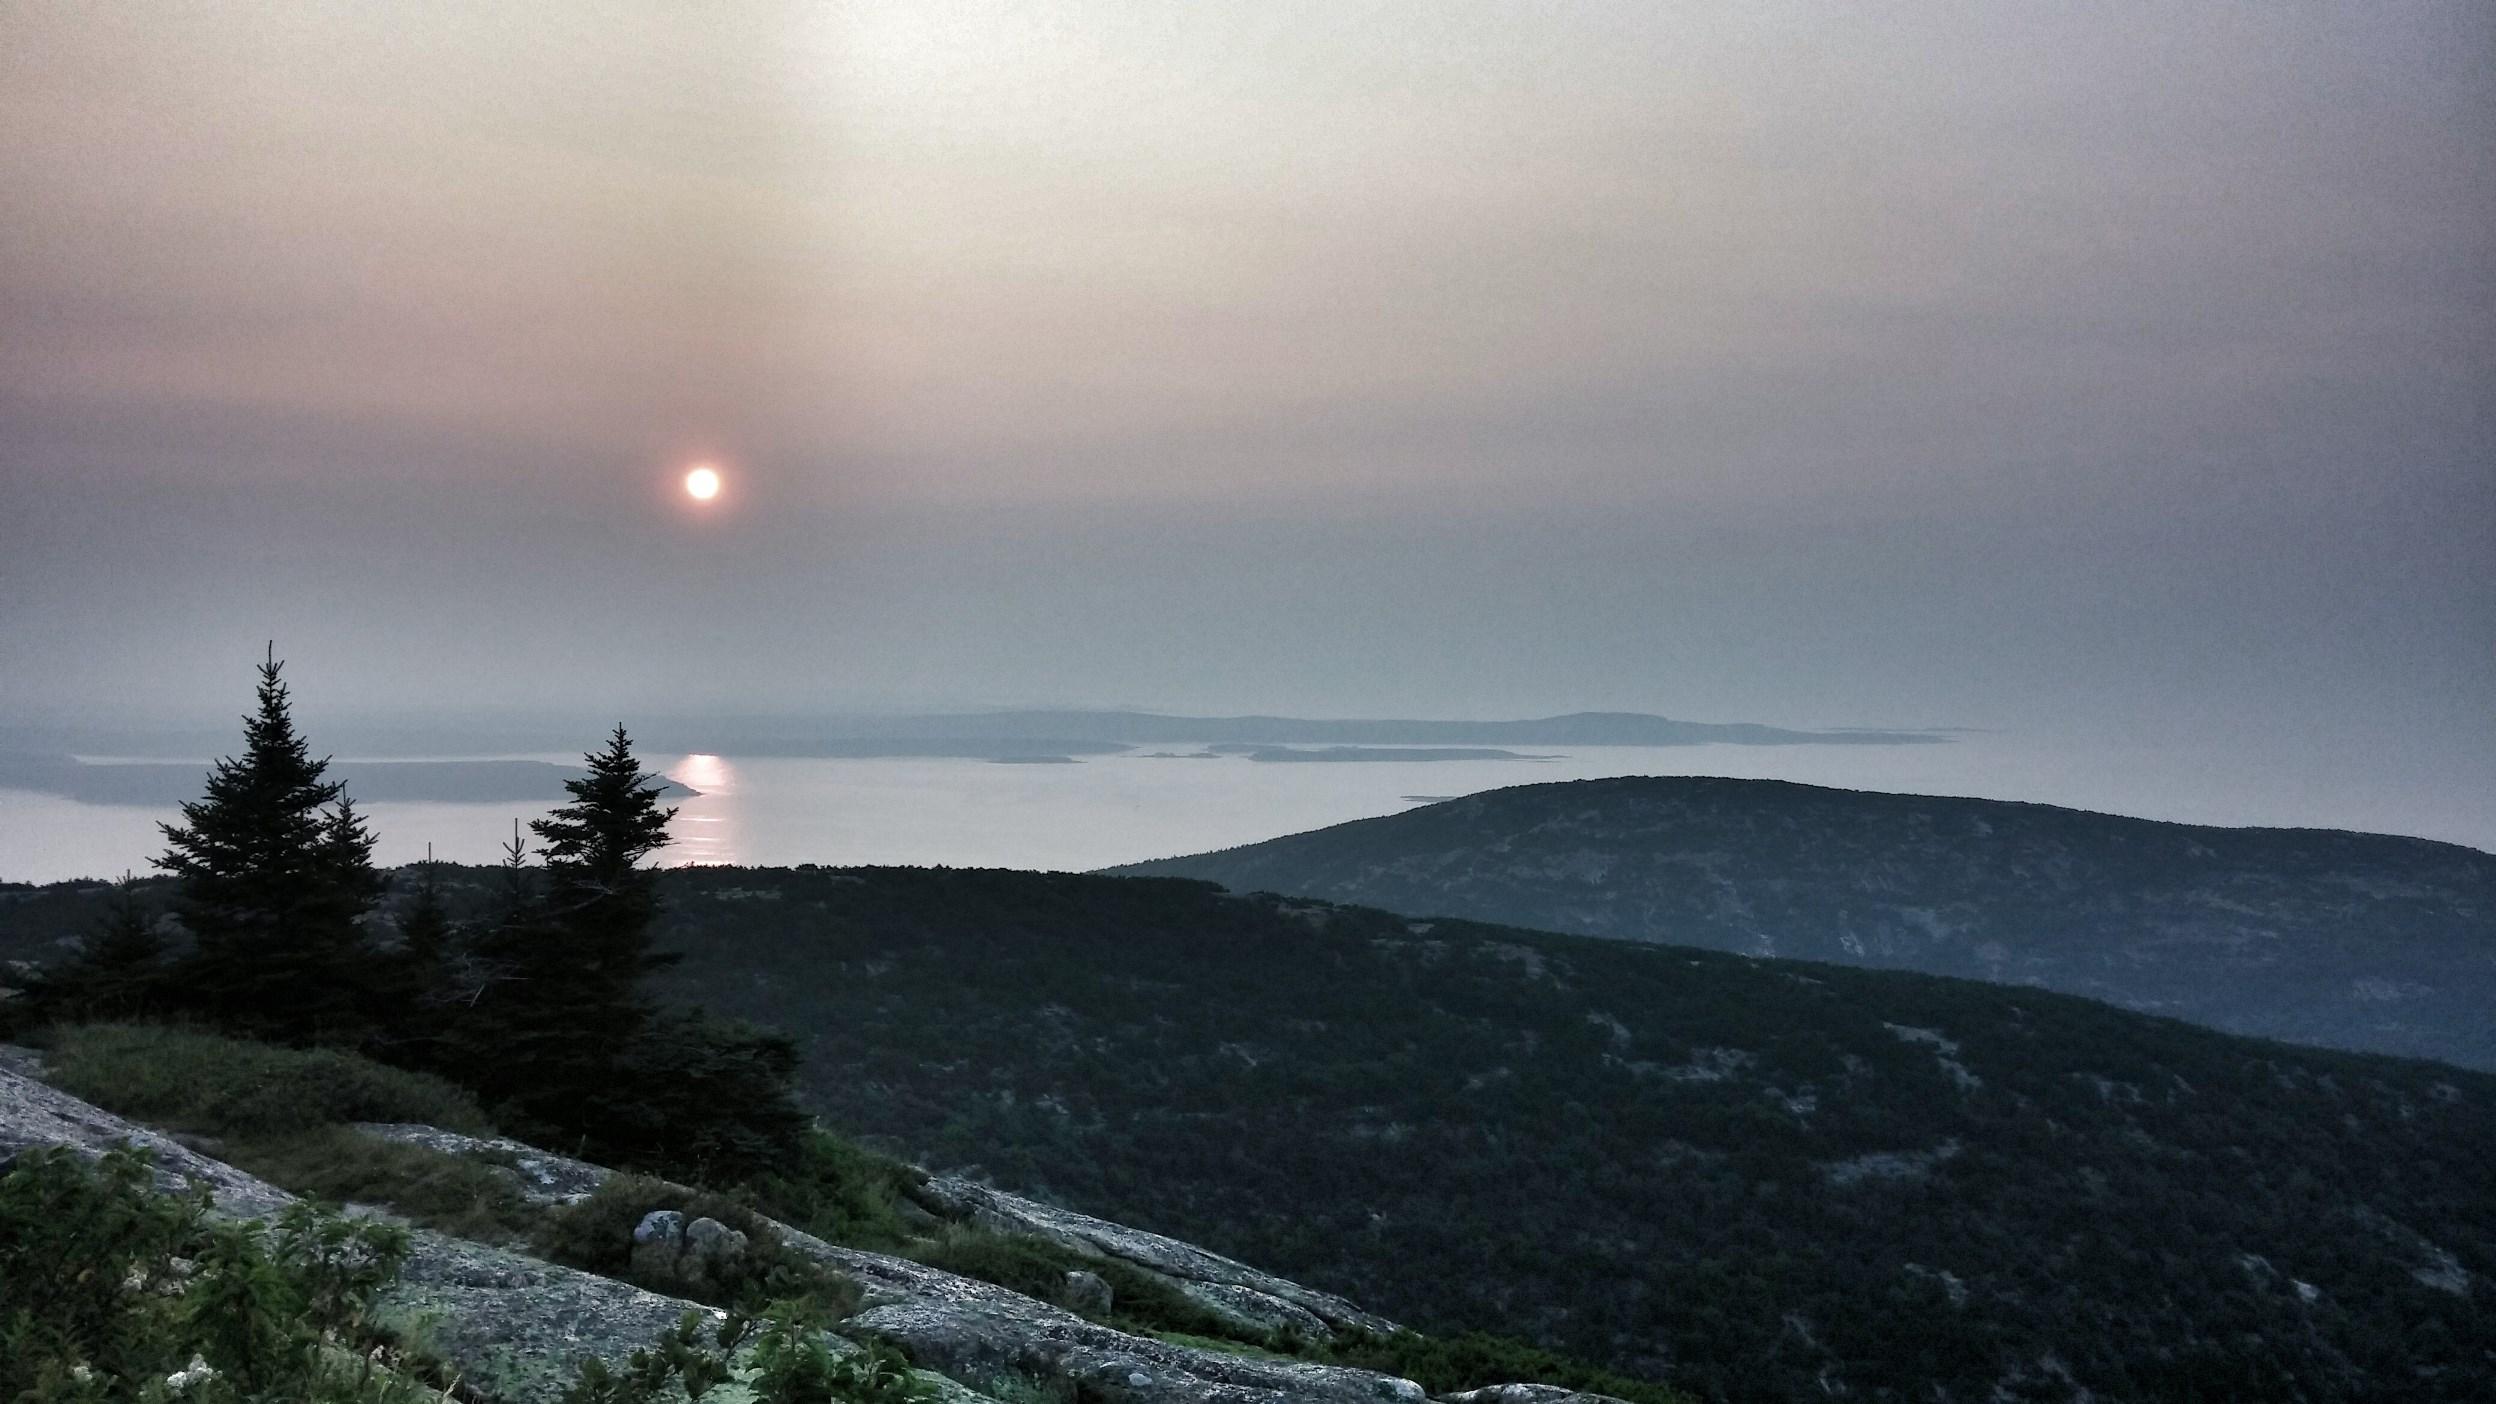 sunrise at cadallac mountain